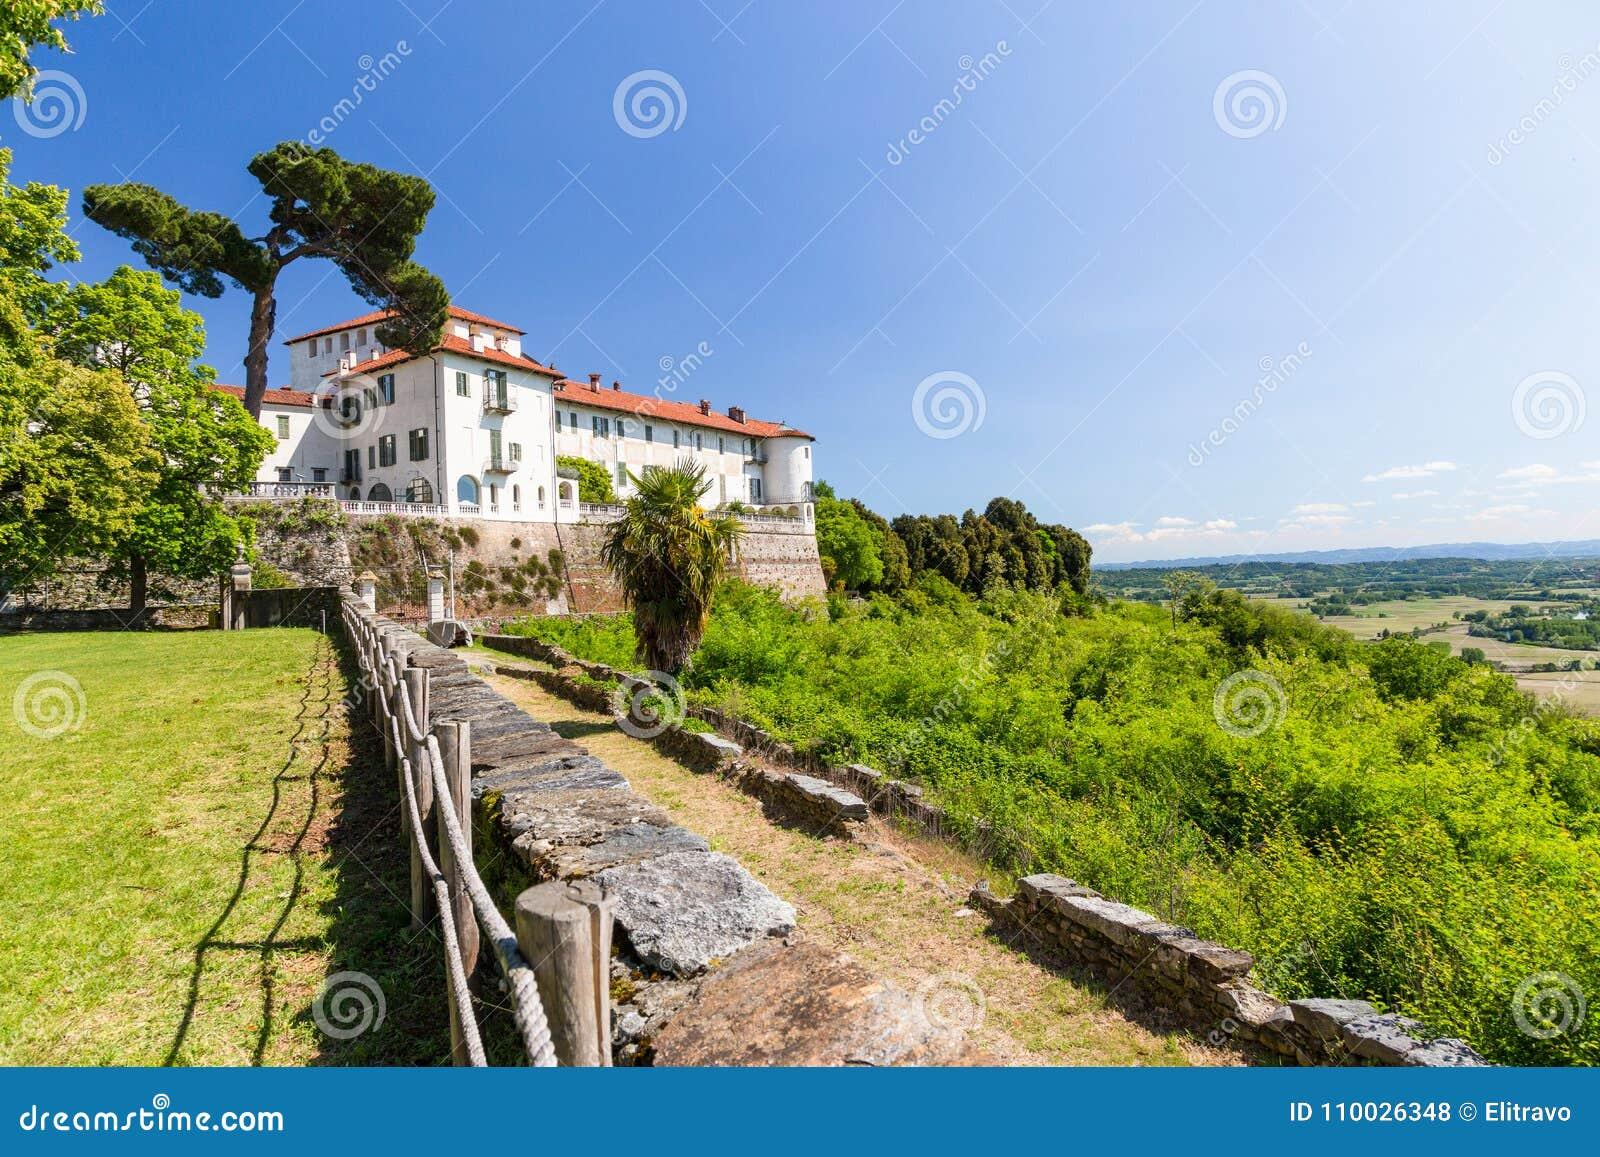 Masinokasteel in Piemonte-gebied, Italië